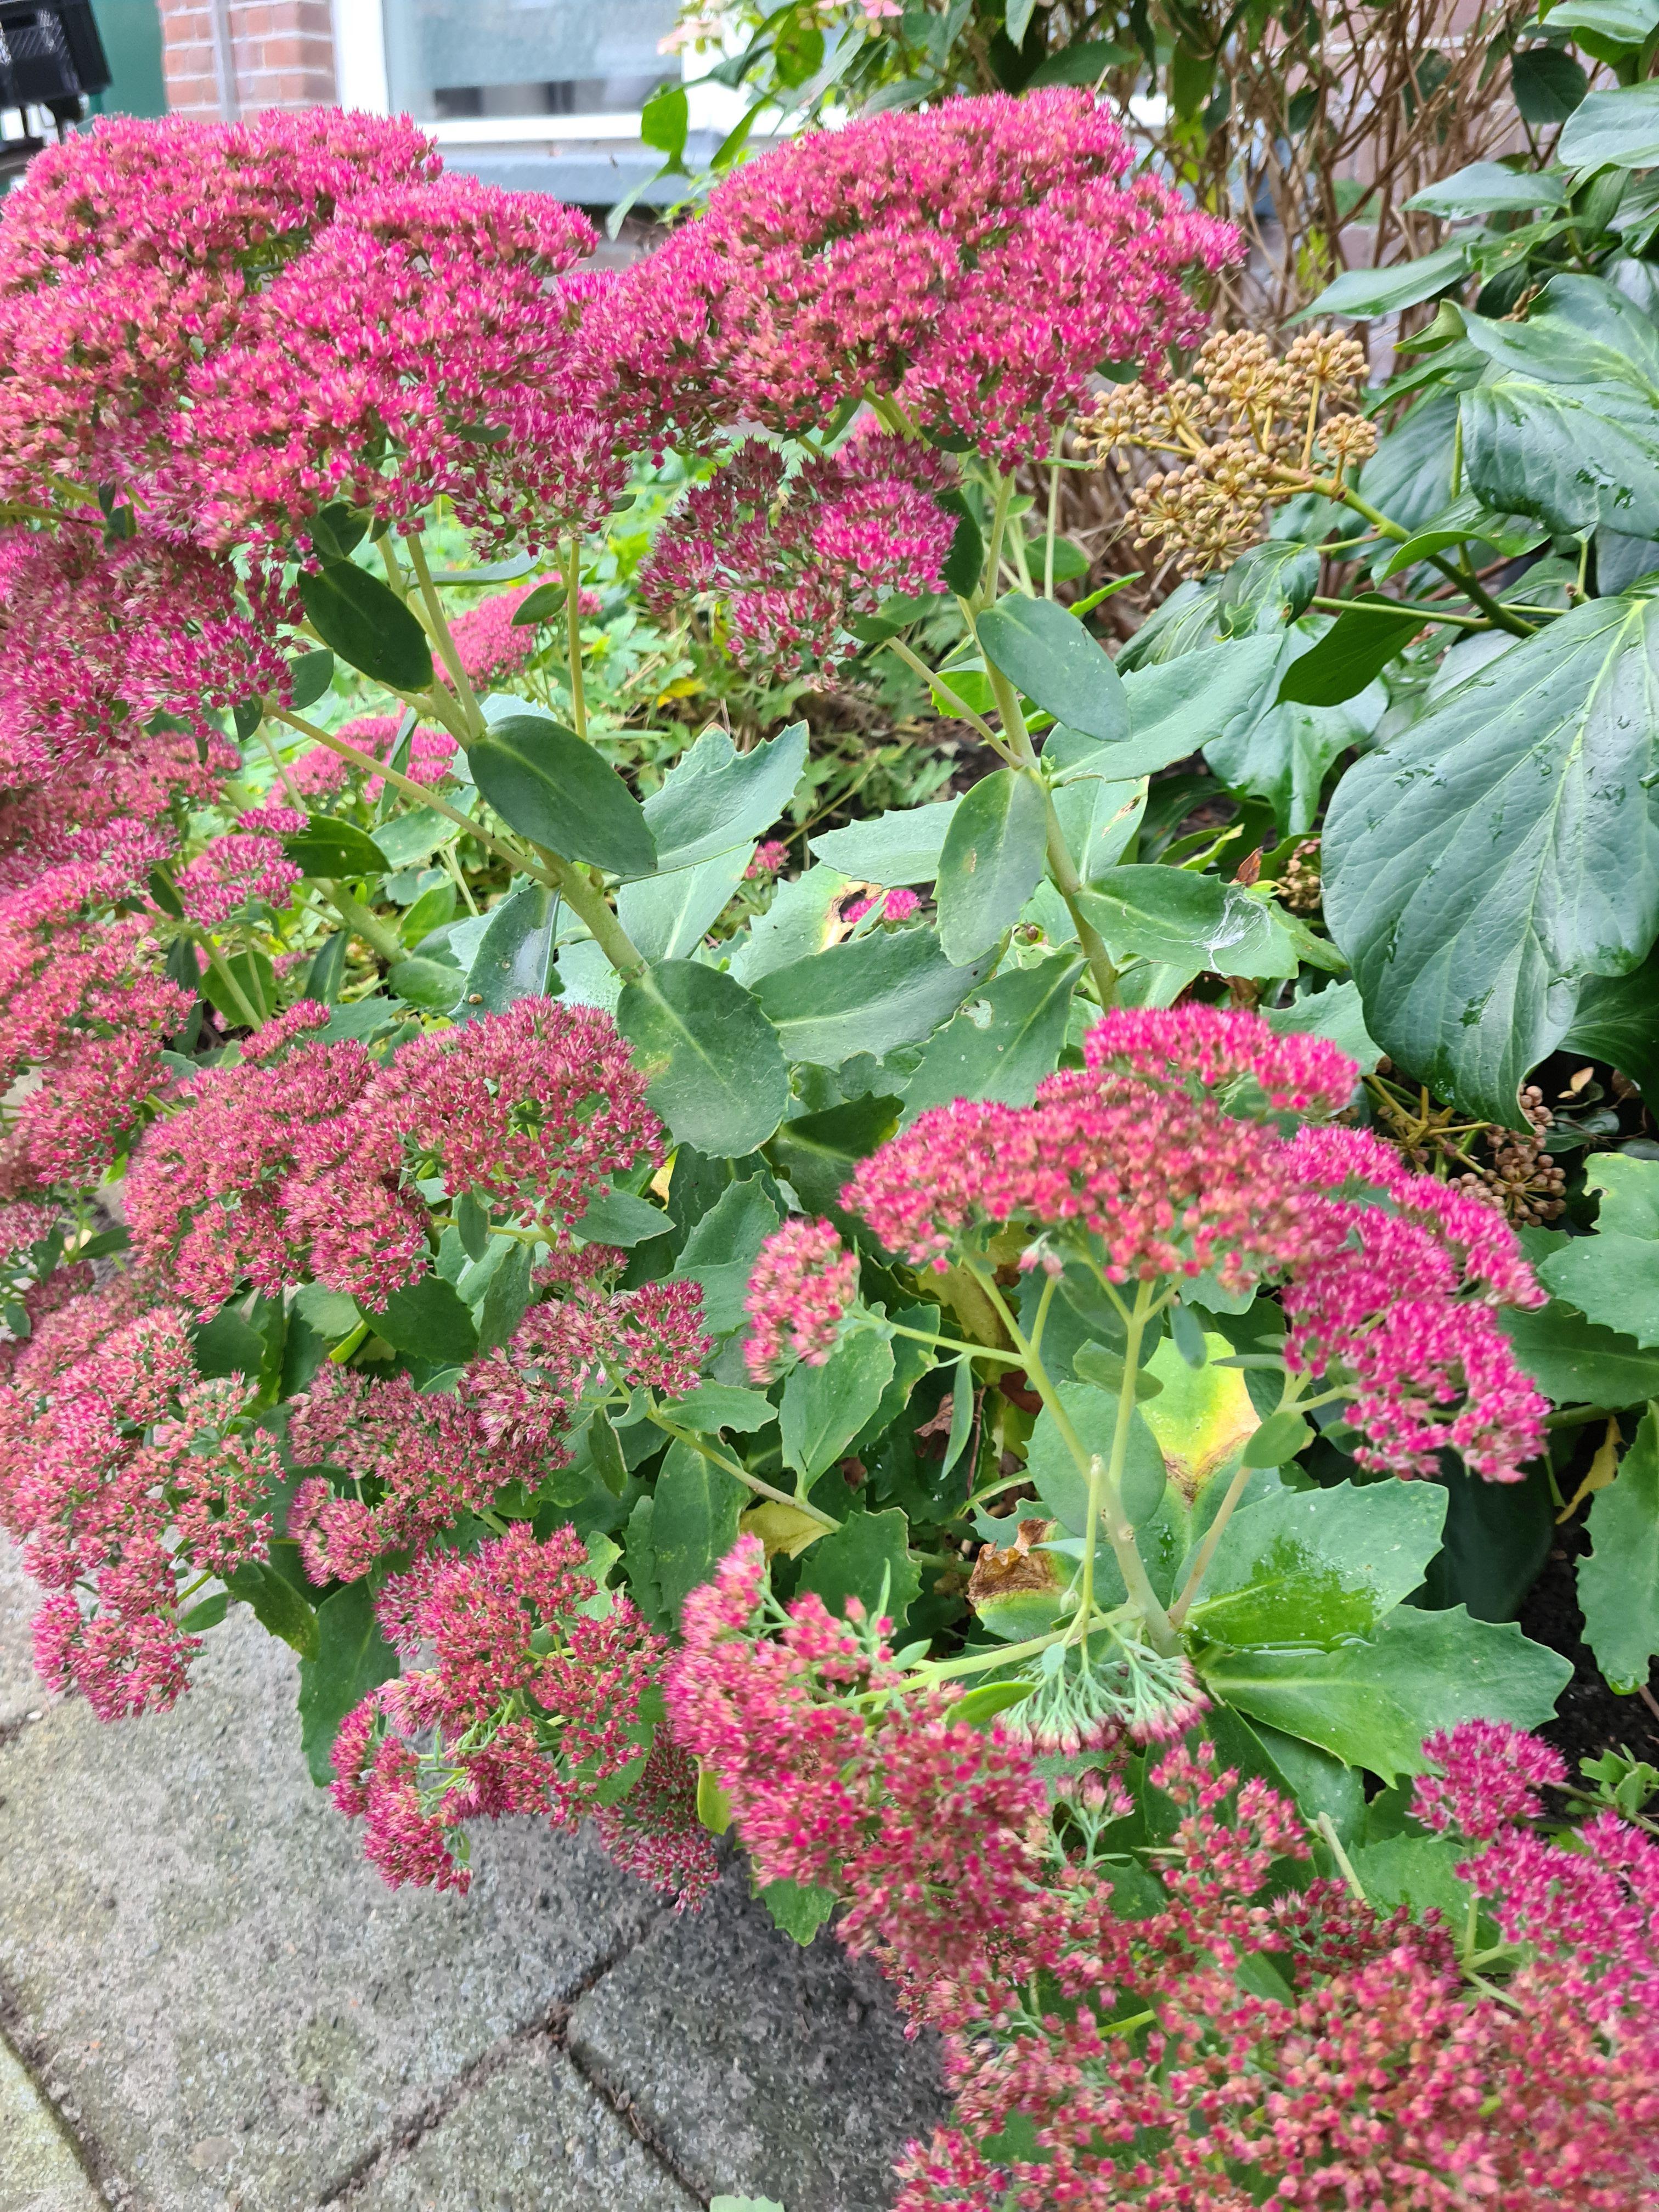 Hemelsleutel sedum vetkruid tuinplanten borderbeplanting